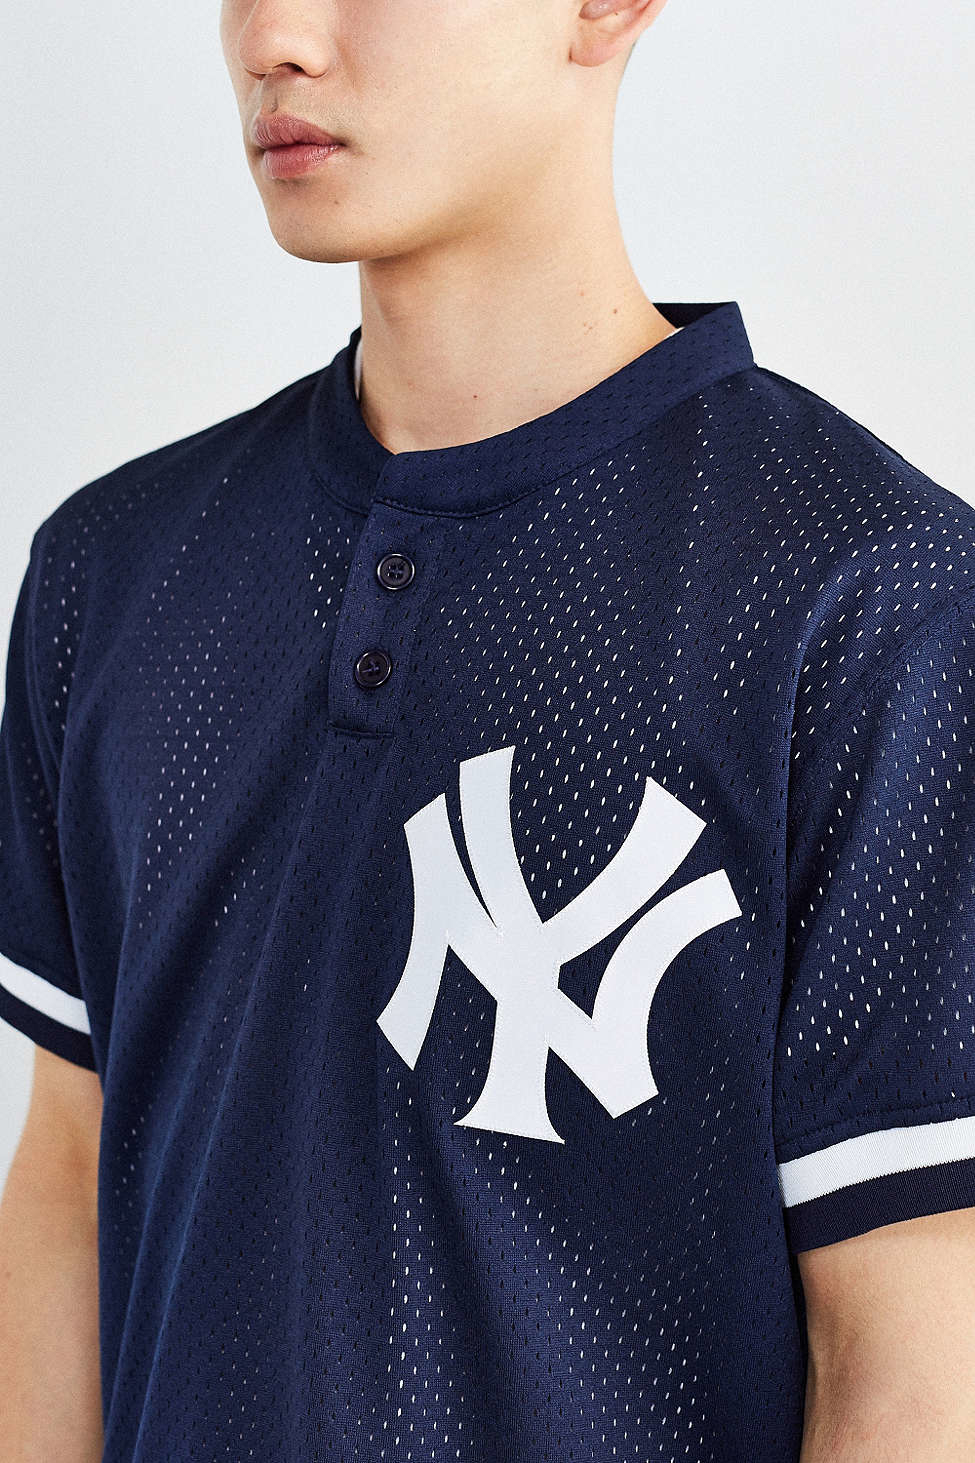 official photos 74b1b b0791 Mitchell & Ness White Yankees Don Mattingly Baseball Tee for men